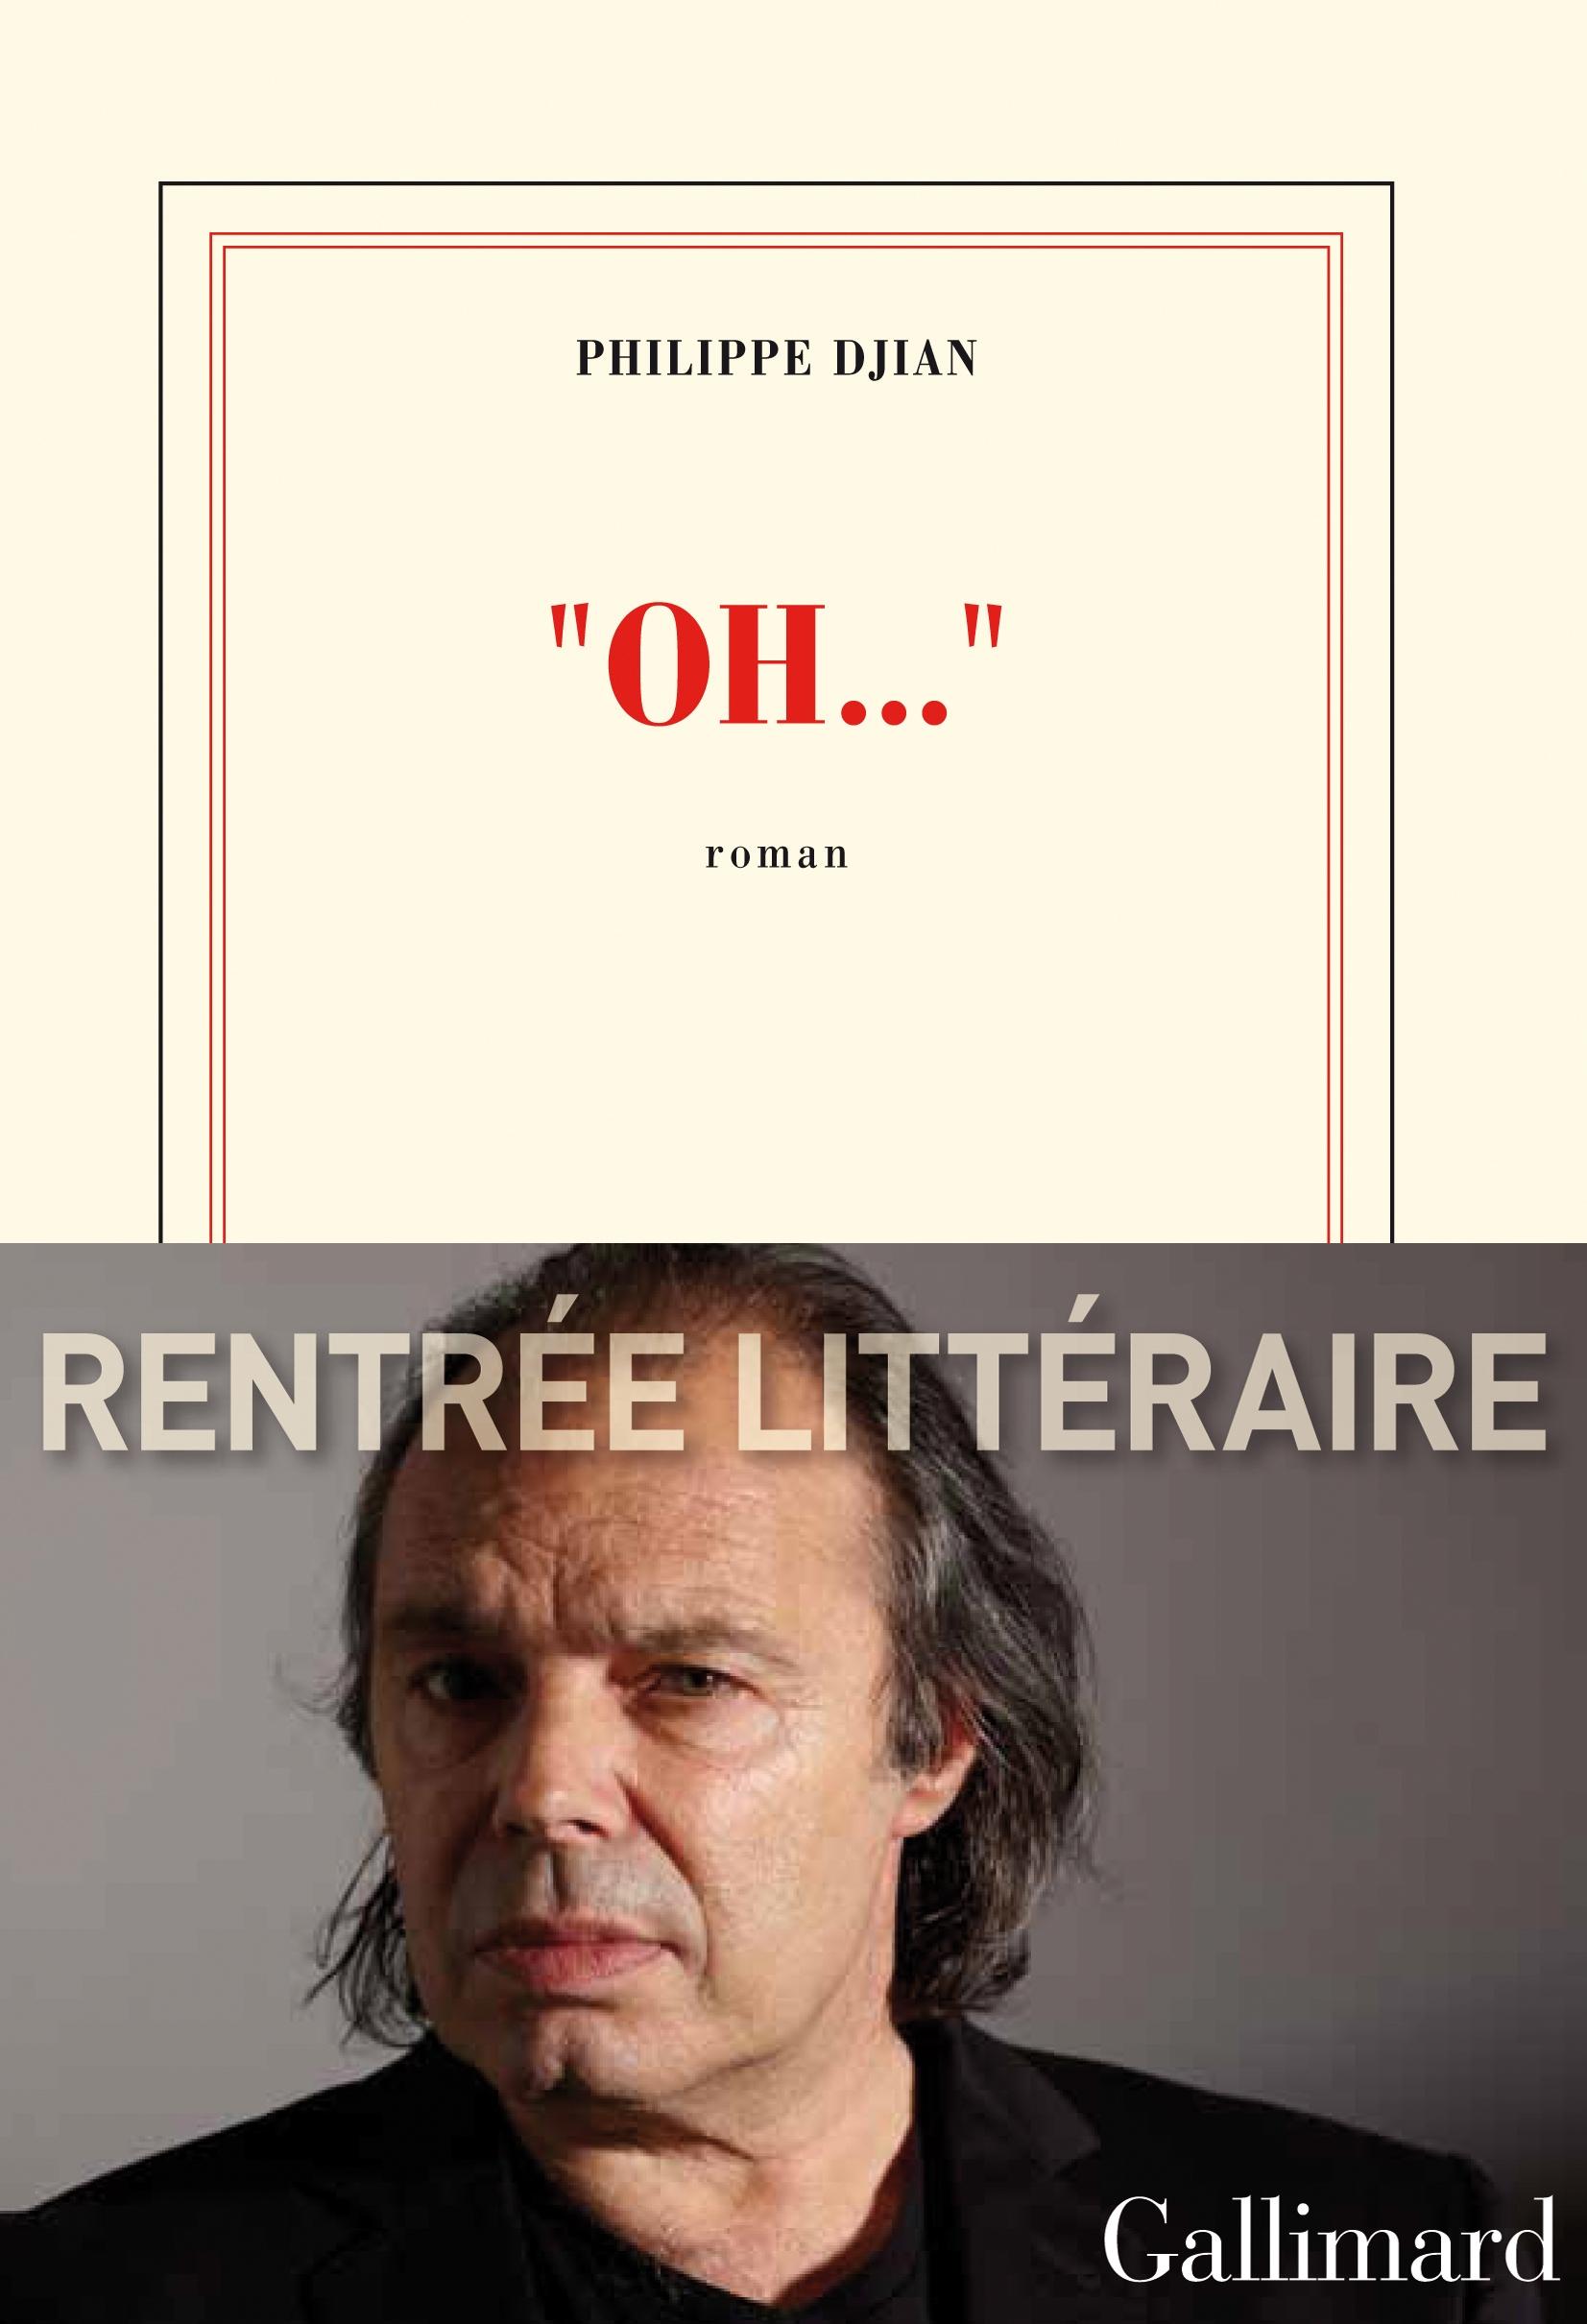 http://toutelaculture.com/wp-content/uploads/2012/07/DJIAN-Philippe-COUV-Oh-avec-bande.jpg